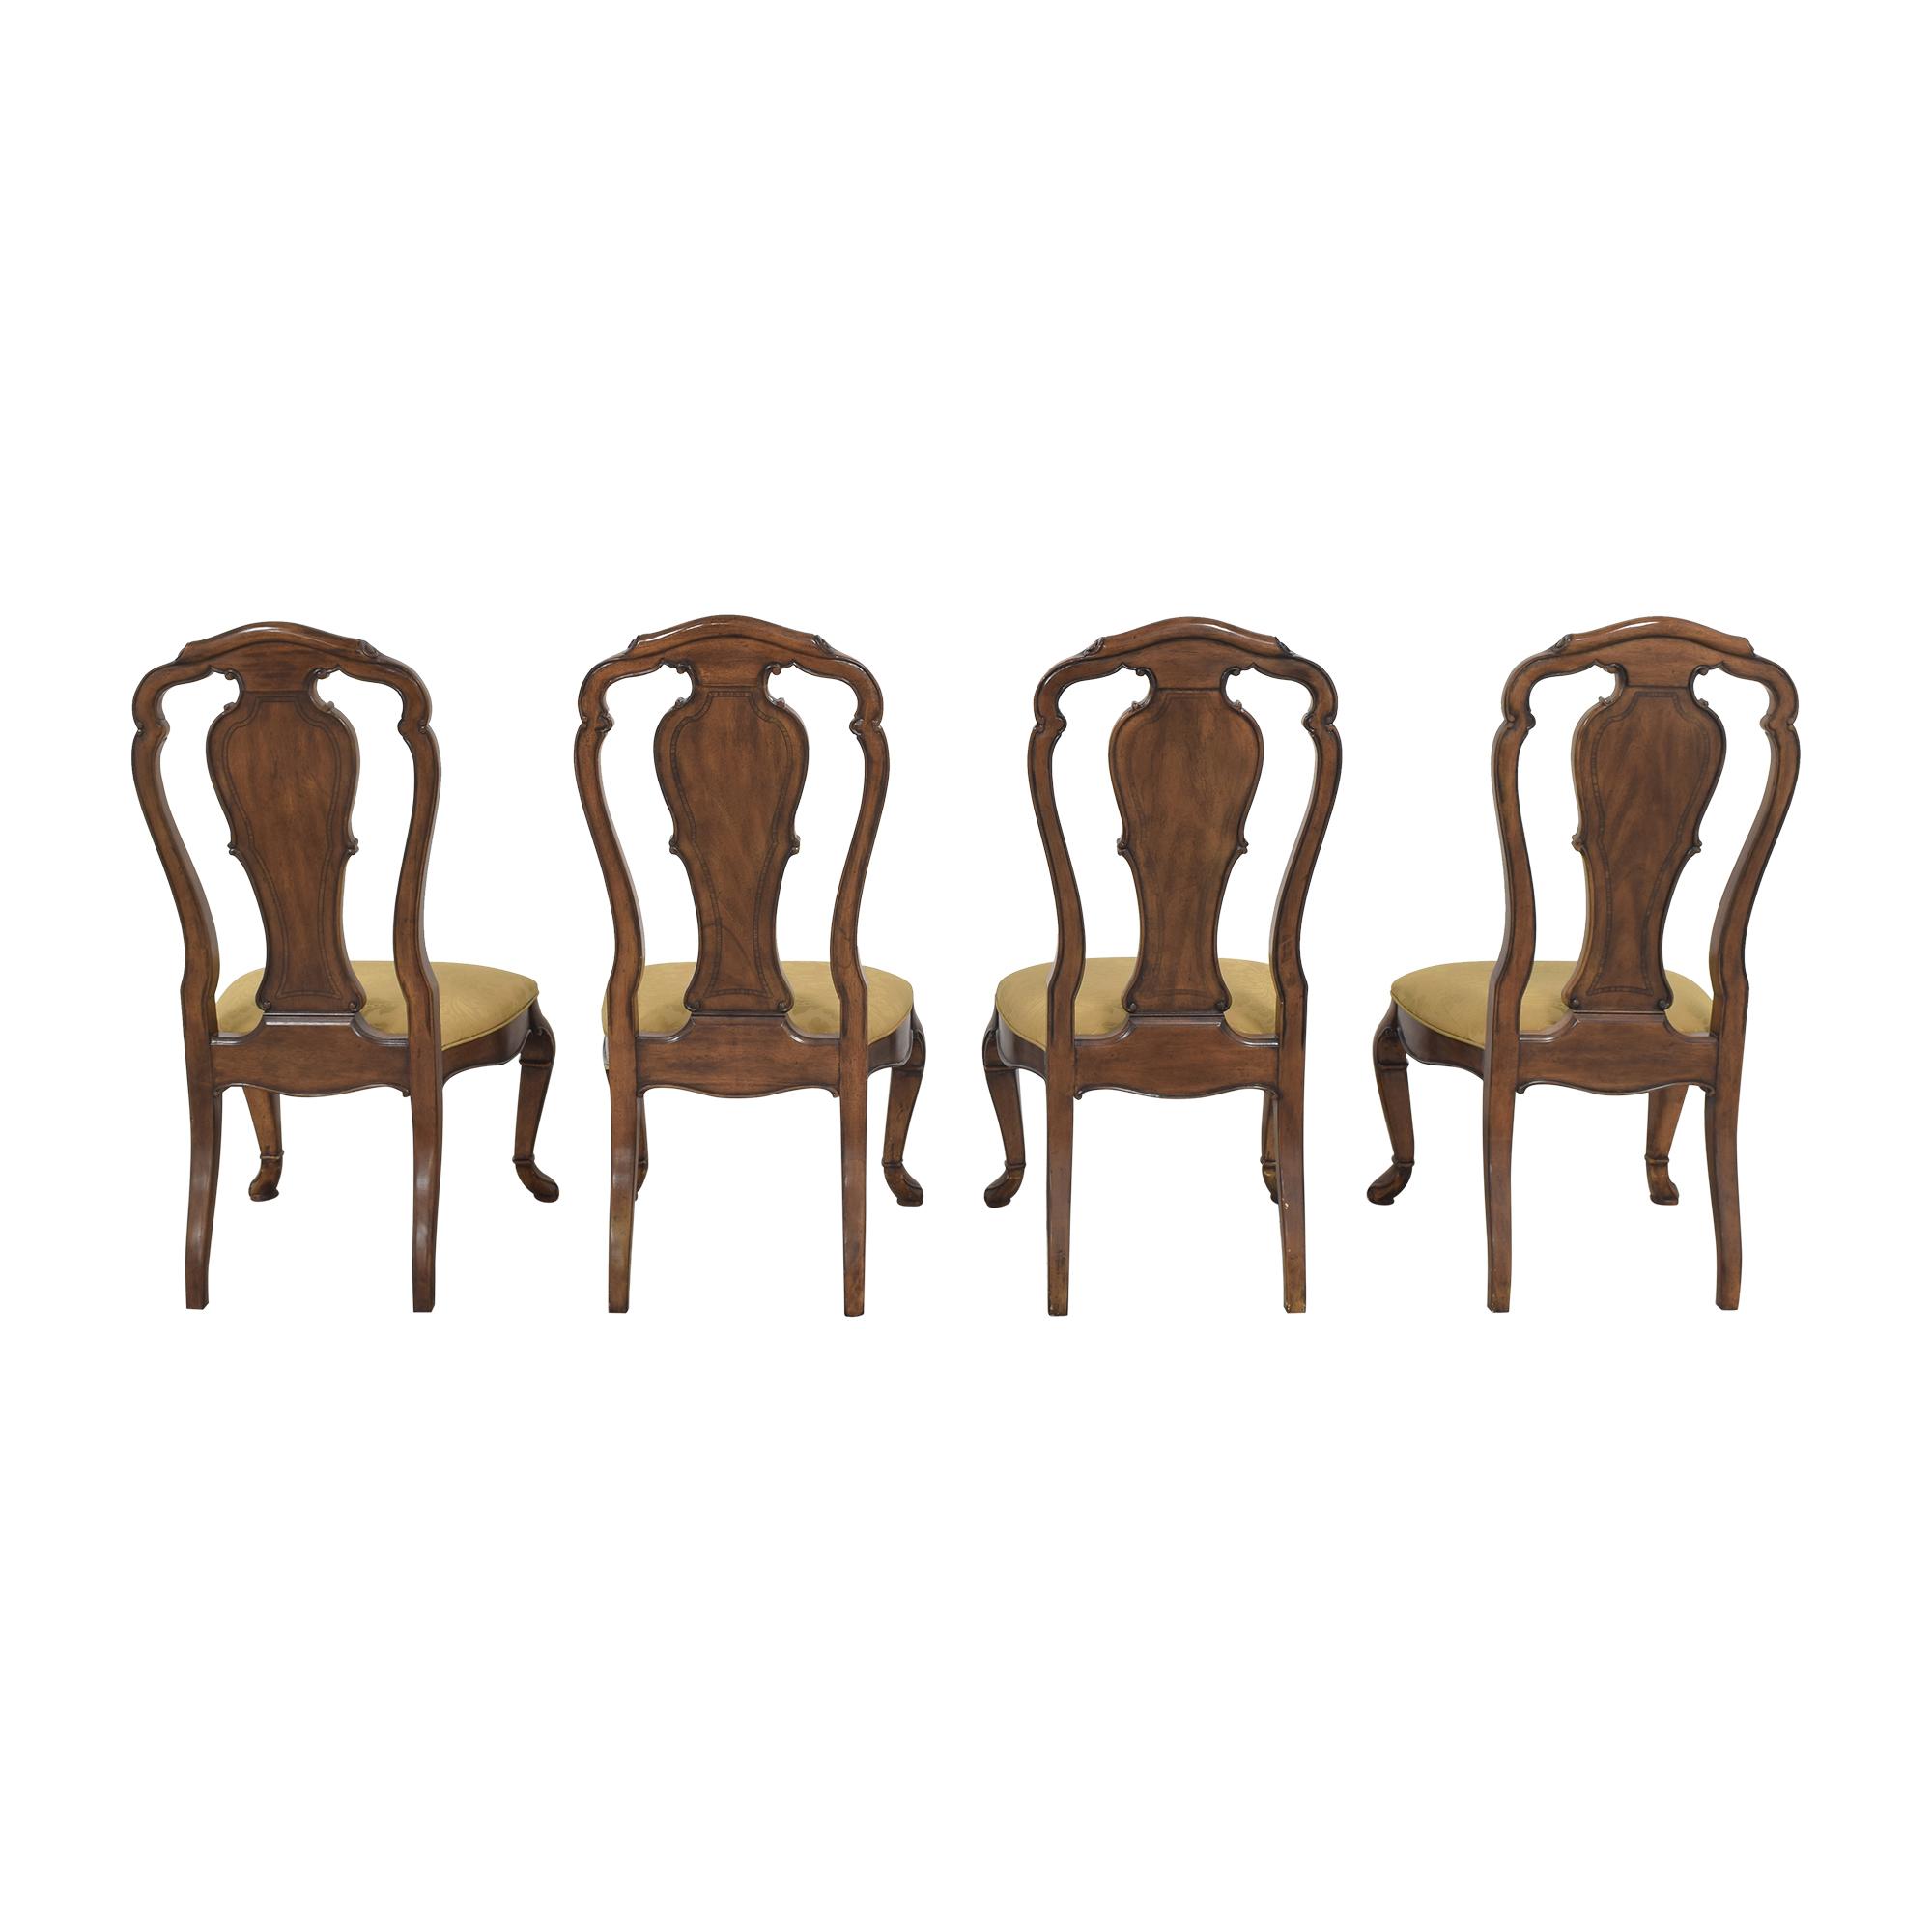 buy Thomasville Thomasville Ernest Hemingway Granada Dining Chairs online